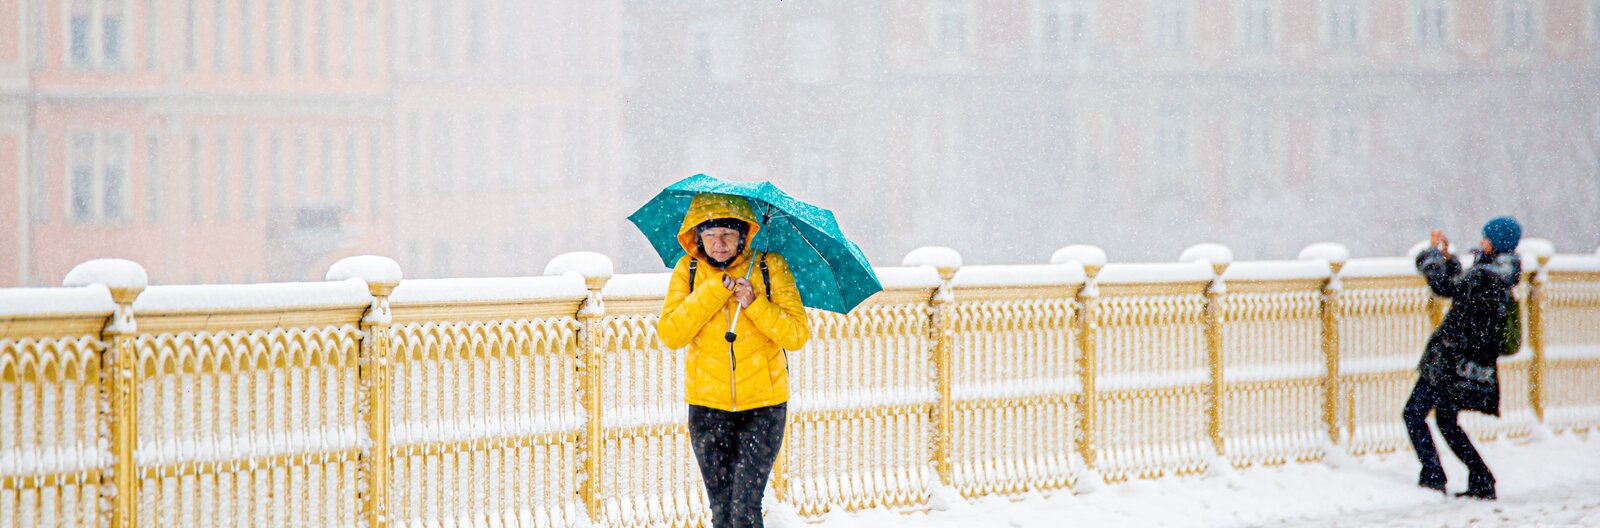 Budapesti bakancslista – 36 programötlet a télre